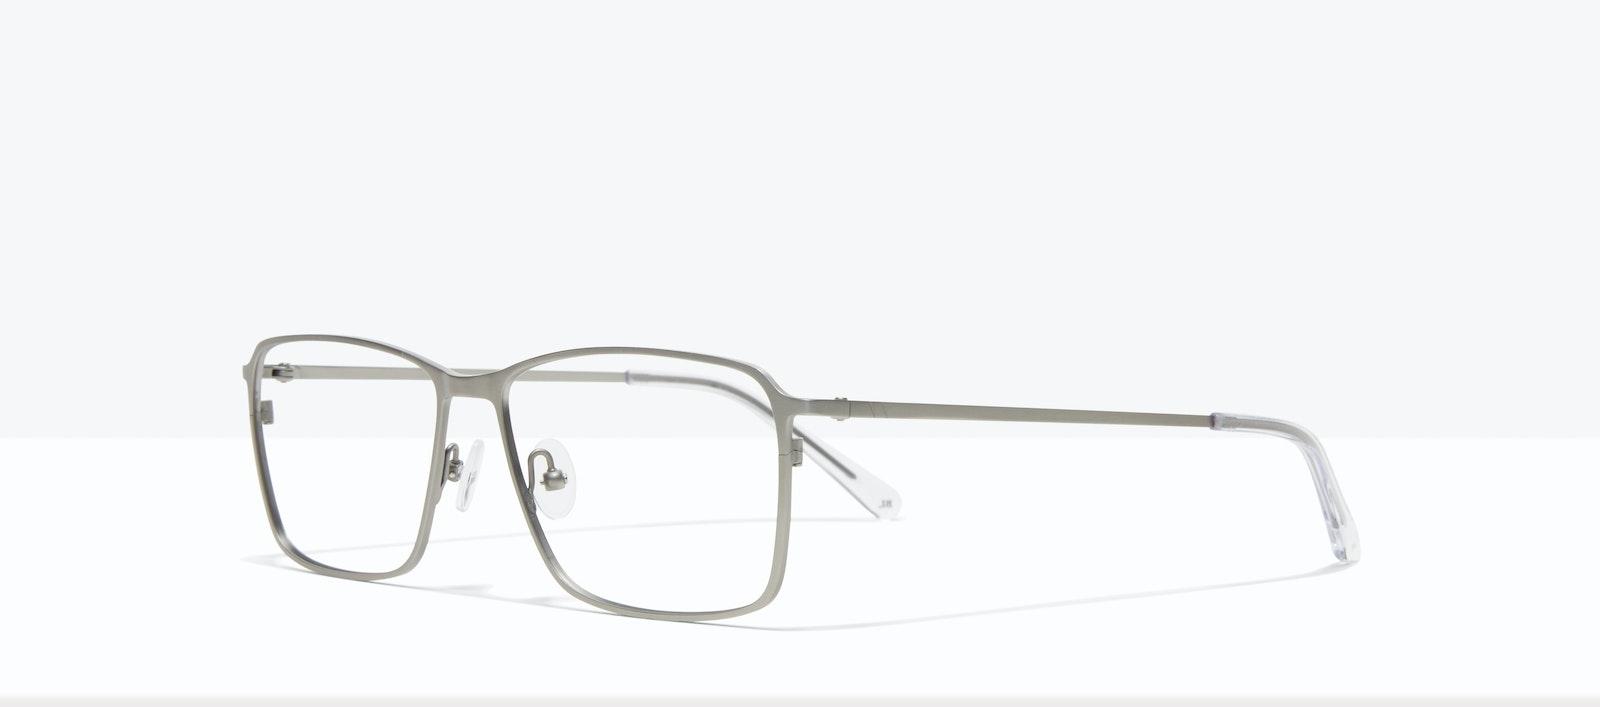 Affordable Fashion Glasses Square Eyeglasses Men Drive Silver Tilt